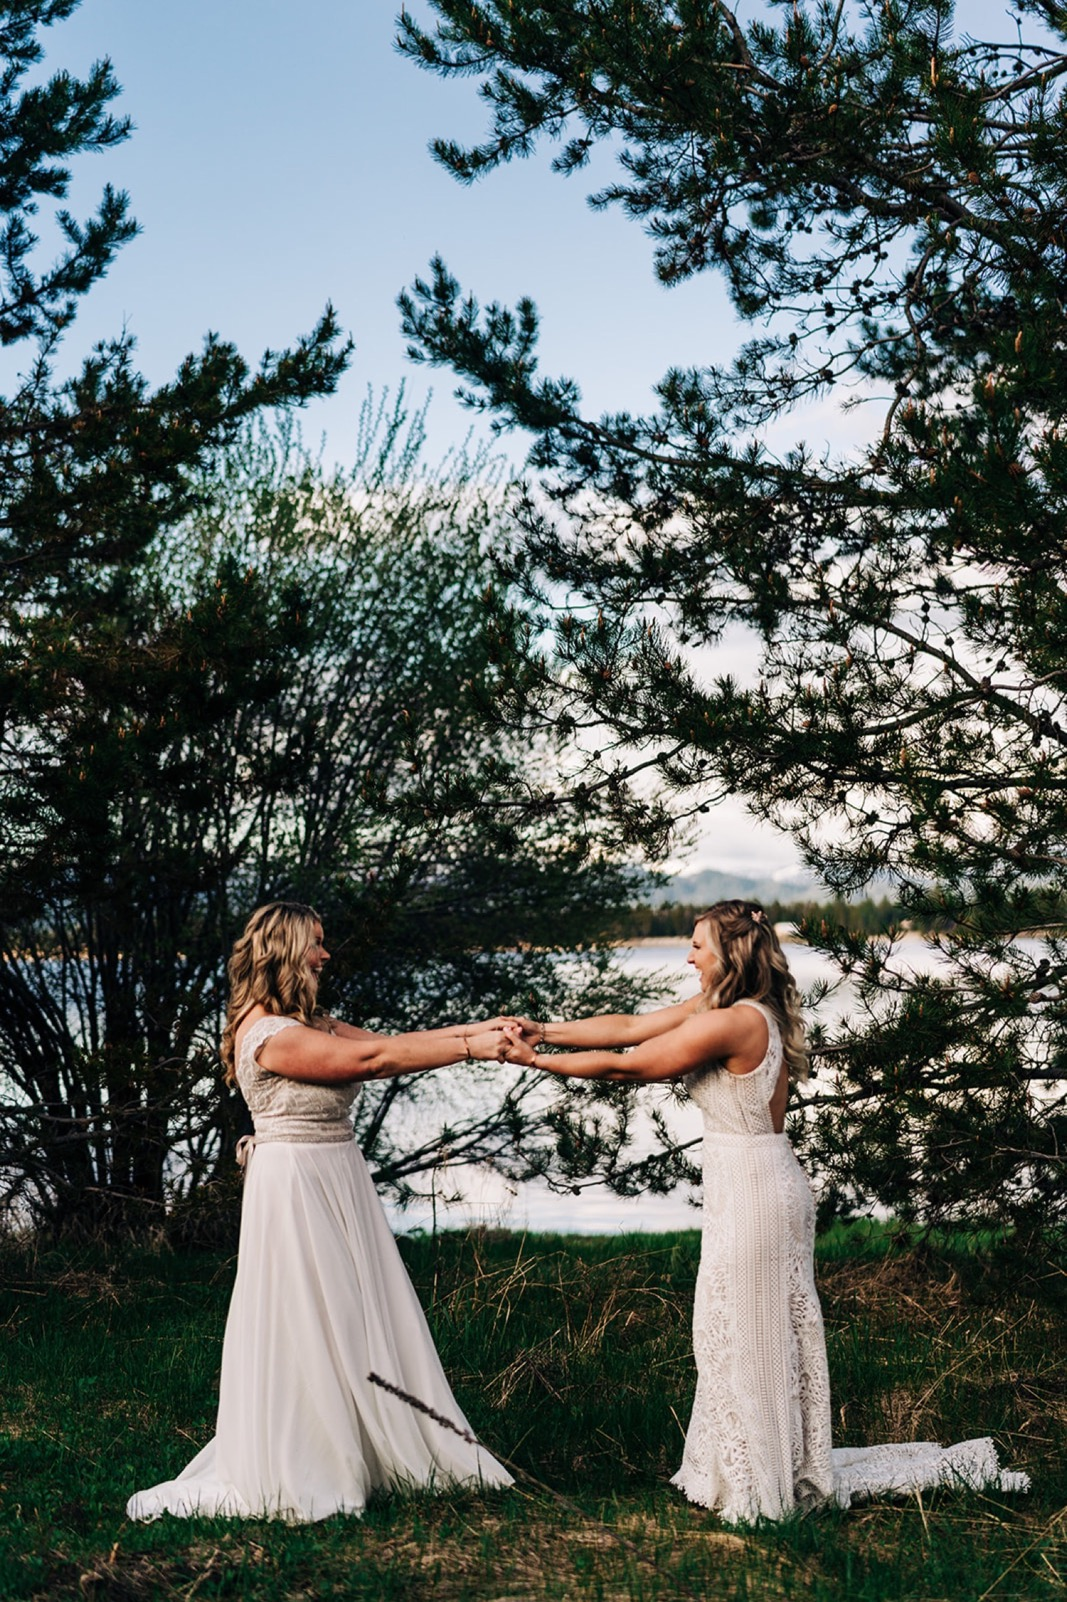 193_falissa_heather_wedding-545.jpg